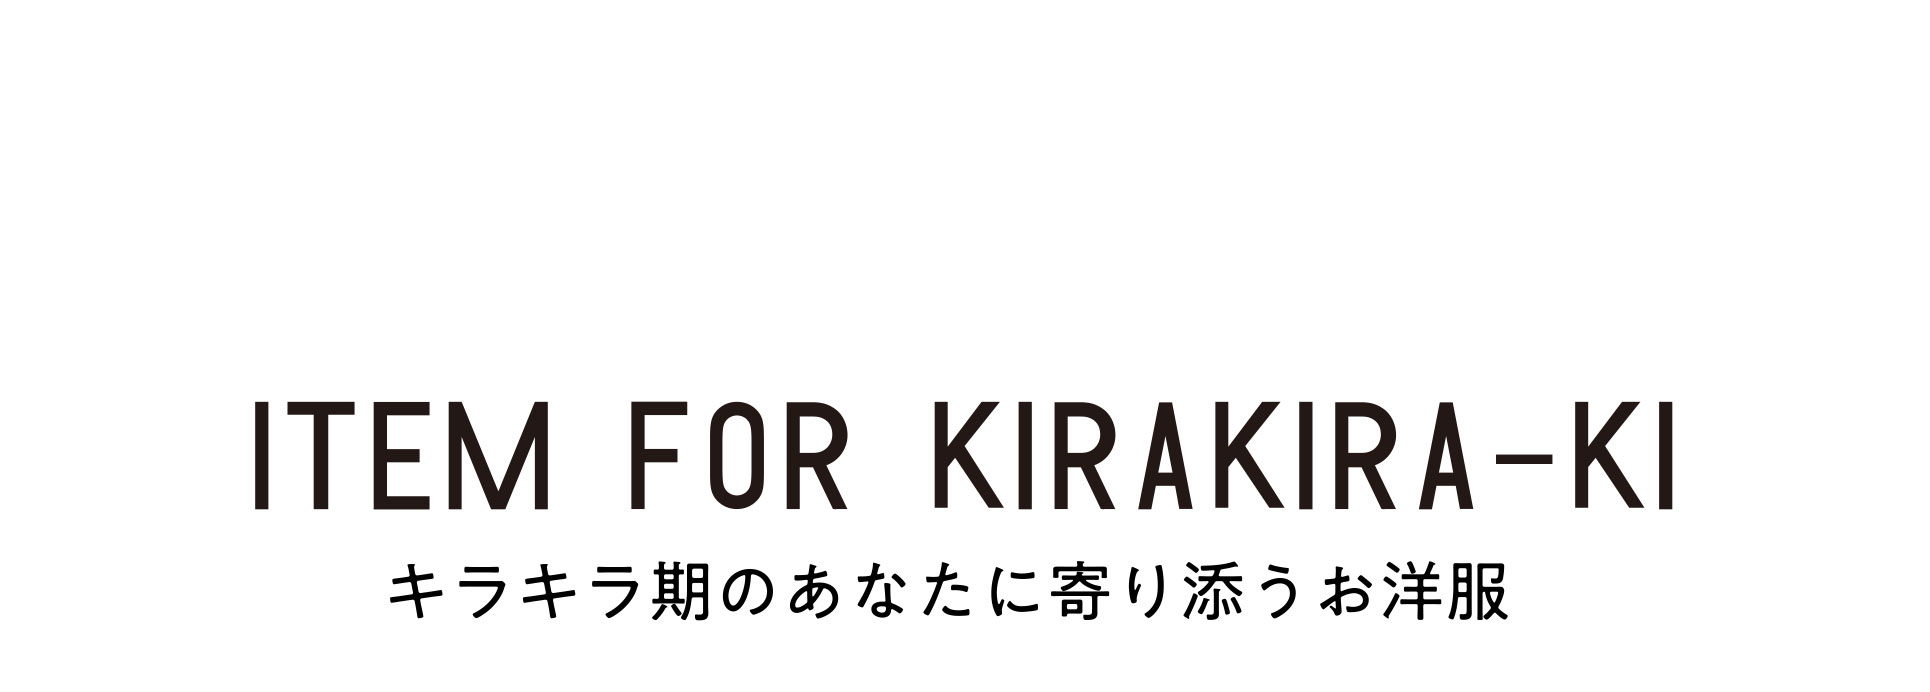 ITEM FOR KIRAKIRA-KI キラキラ期のあなたに寄り添うお洋服